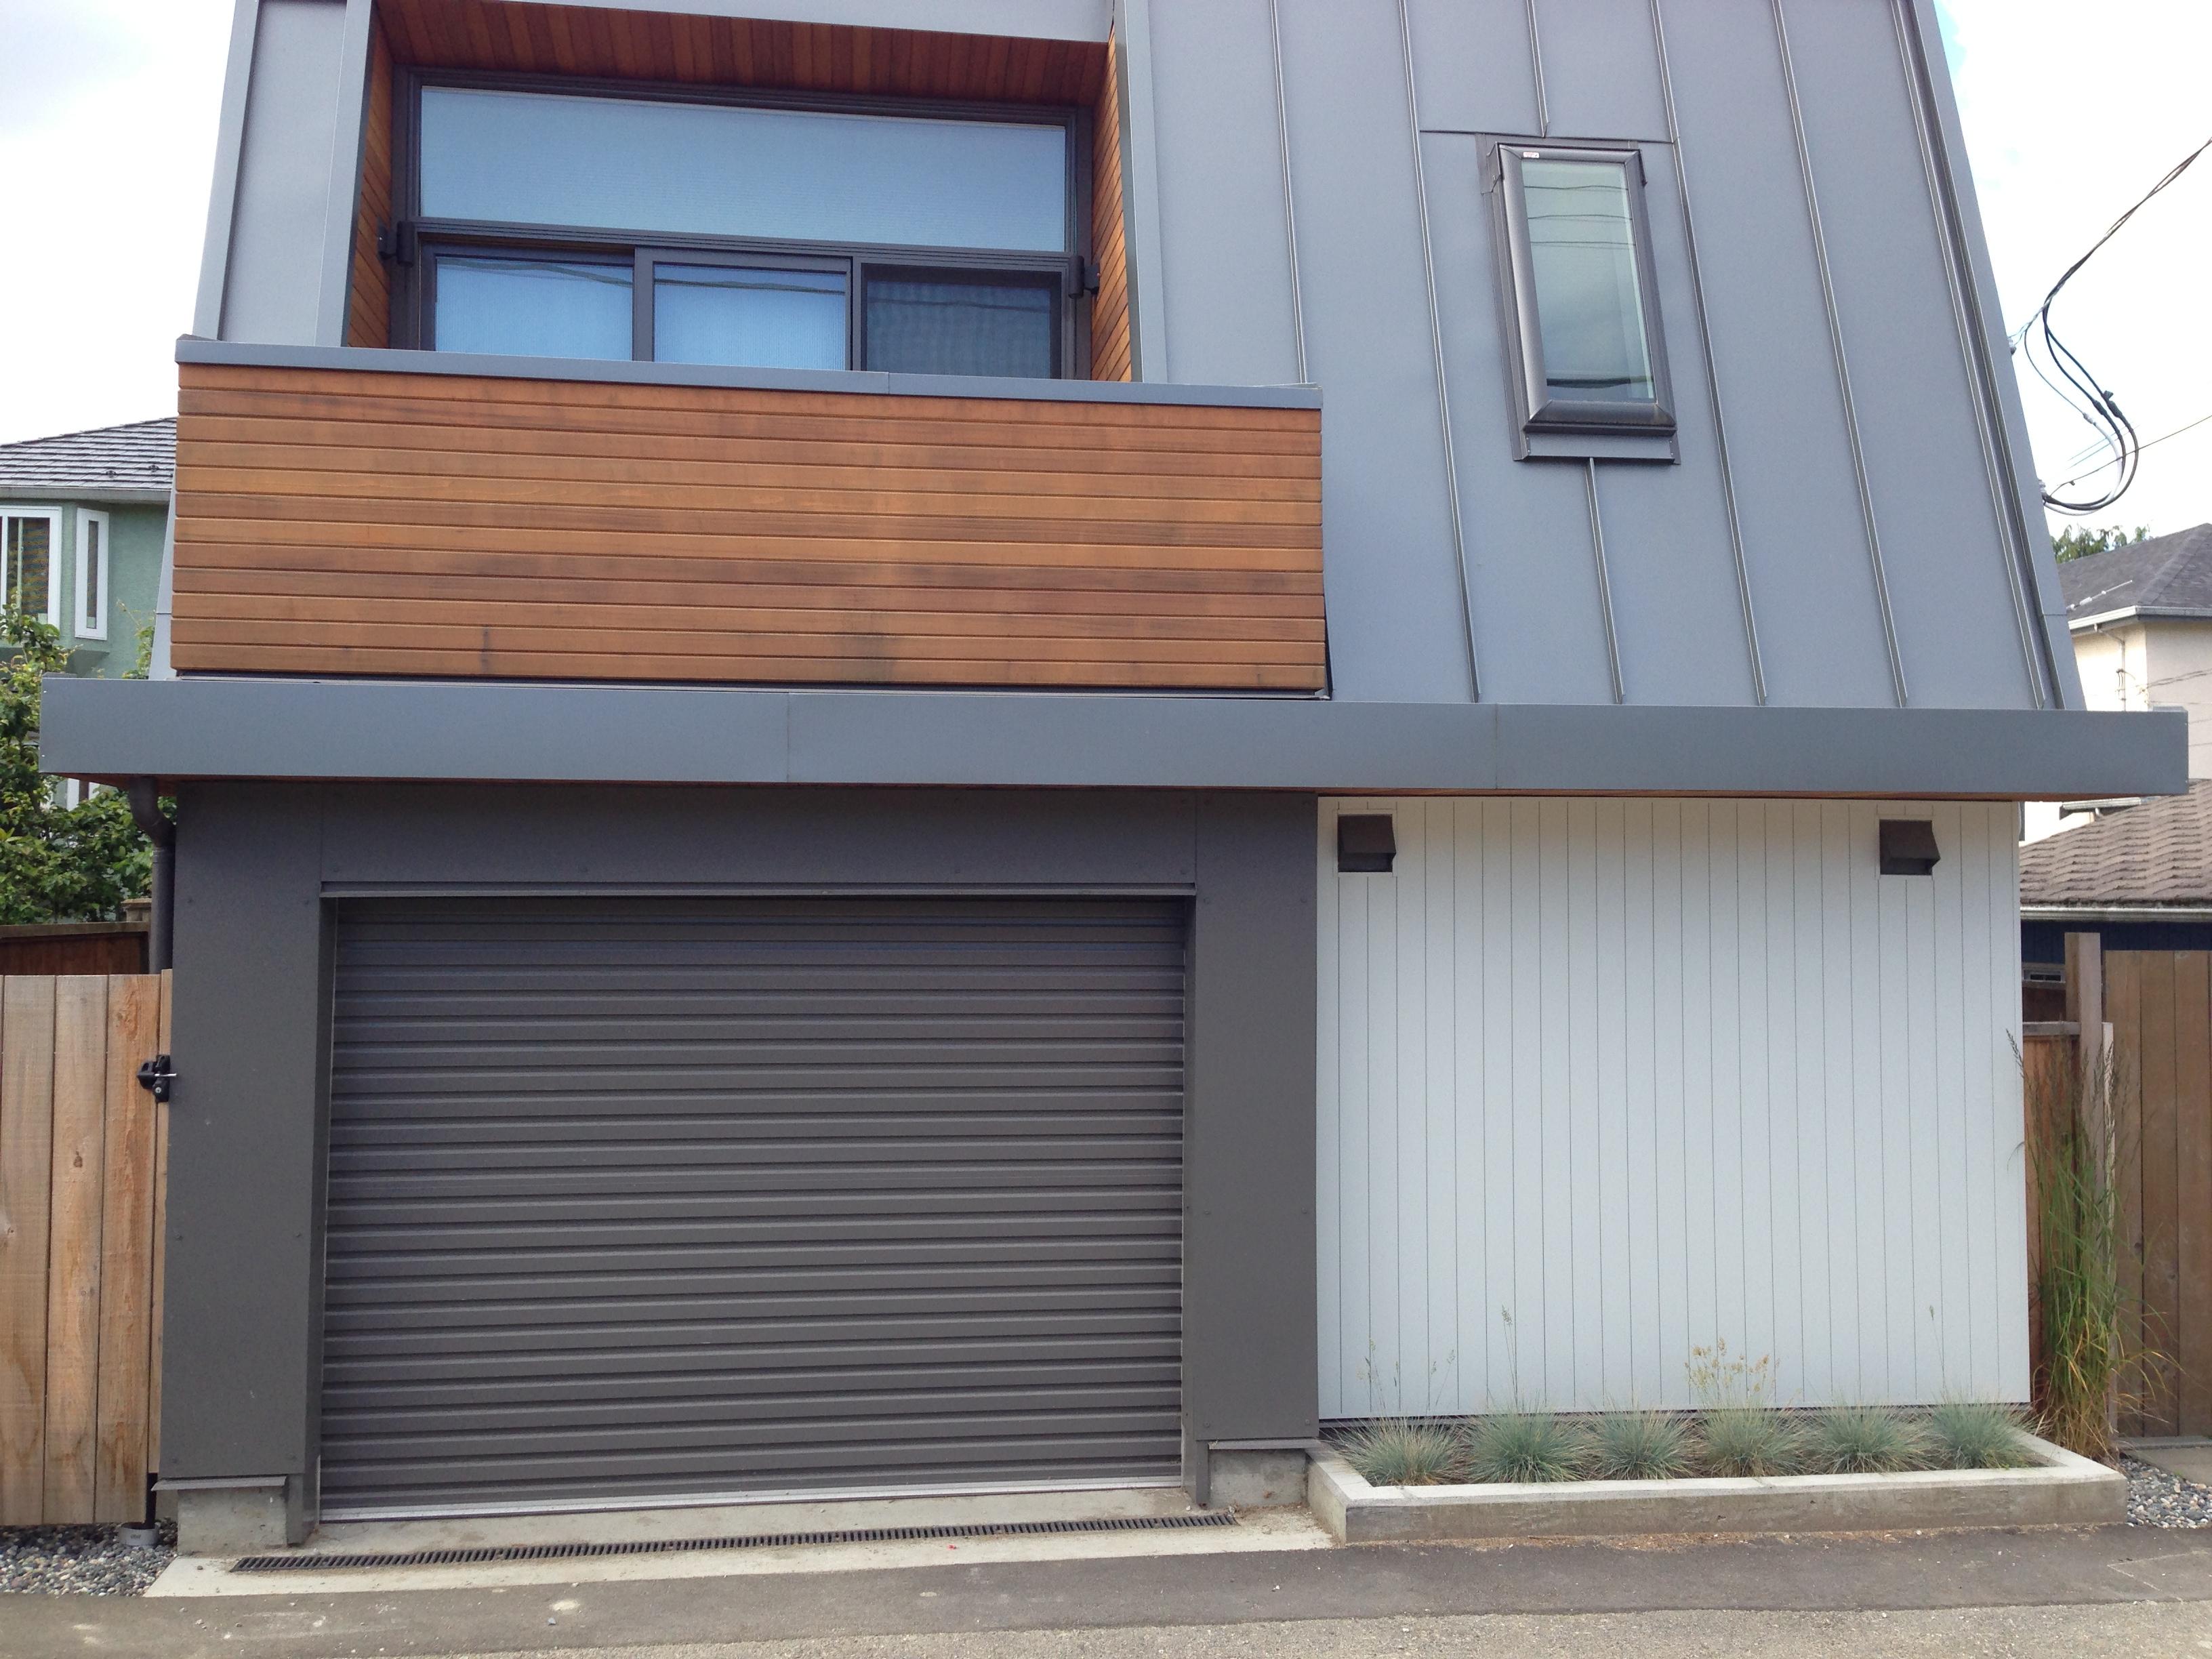 Grey Garage Doors Examples Ideas Pictures Just Another Doors Design For Home